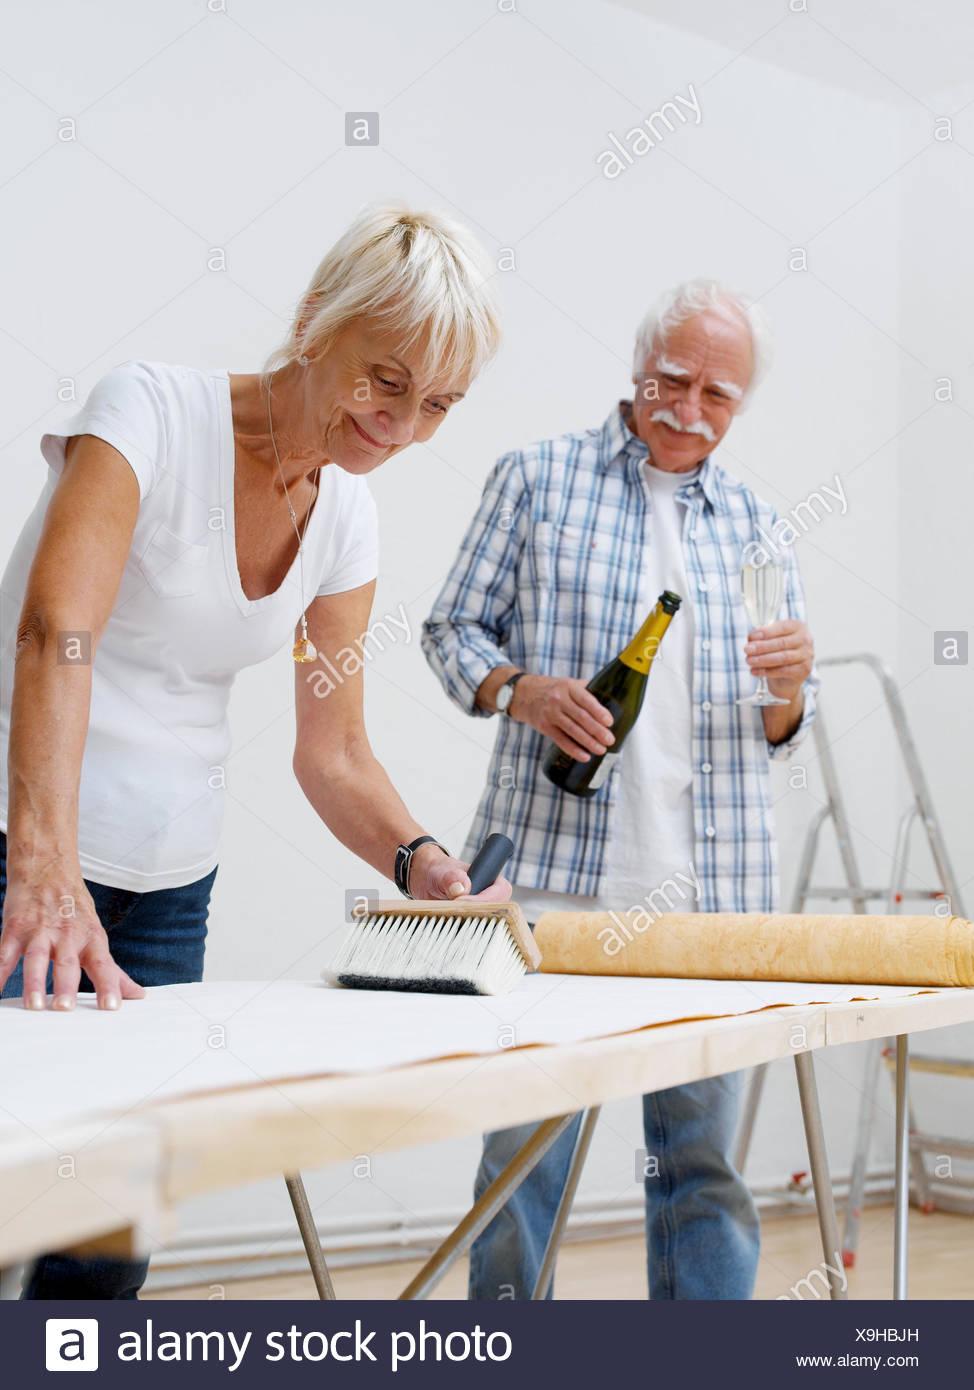 Flat Renovation Works Senior Couple Wallpaper 60 70 Years